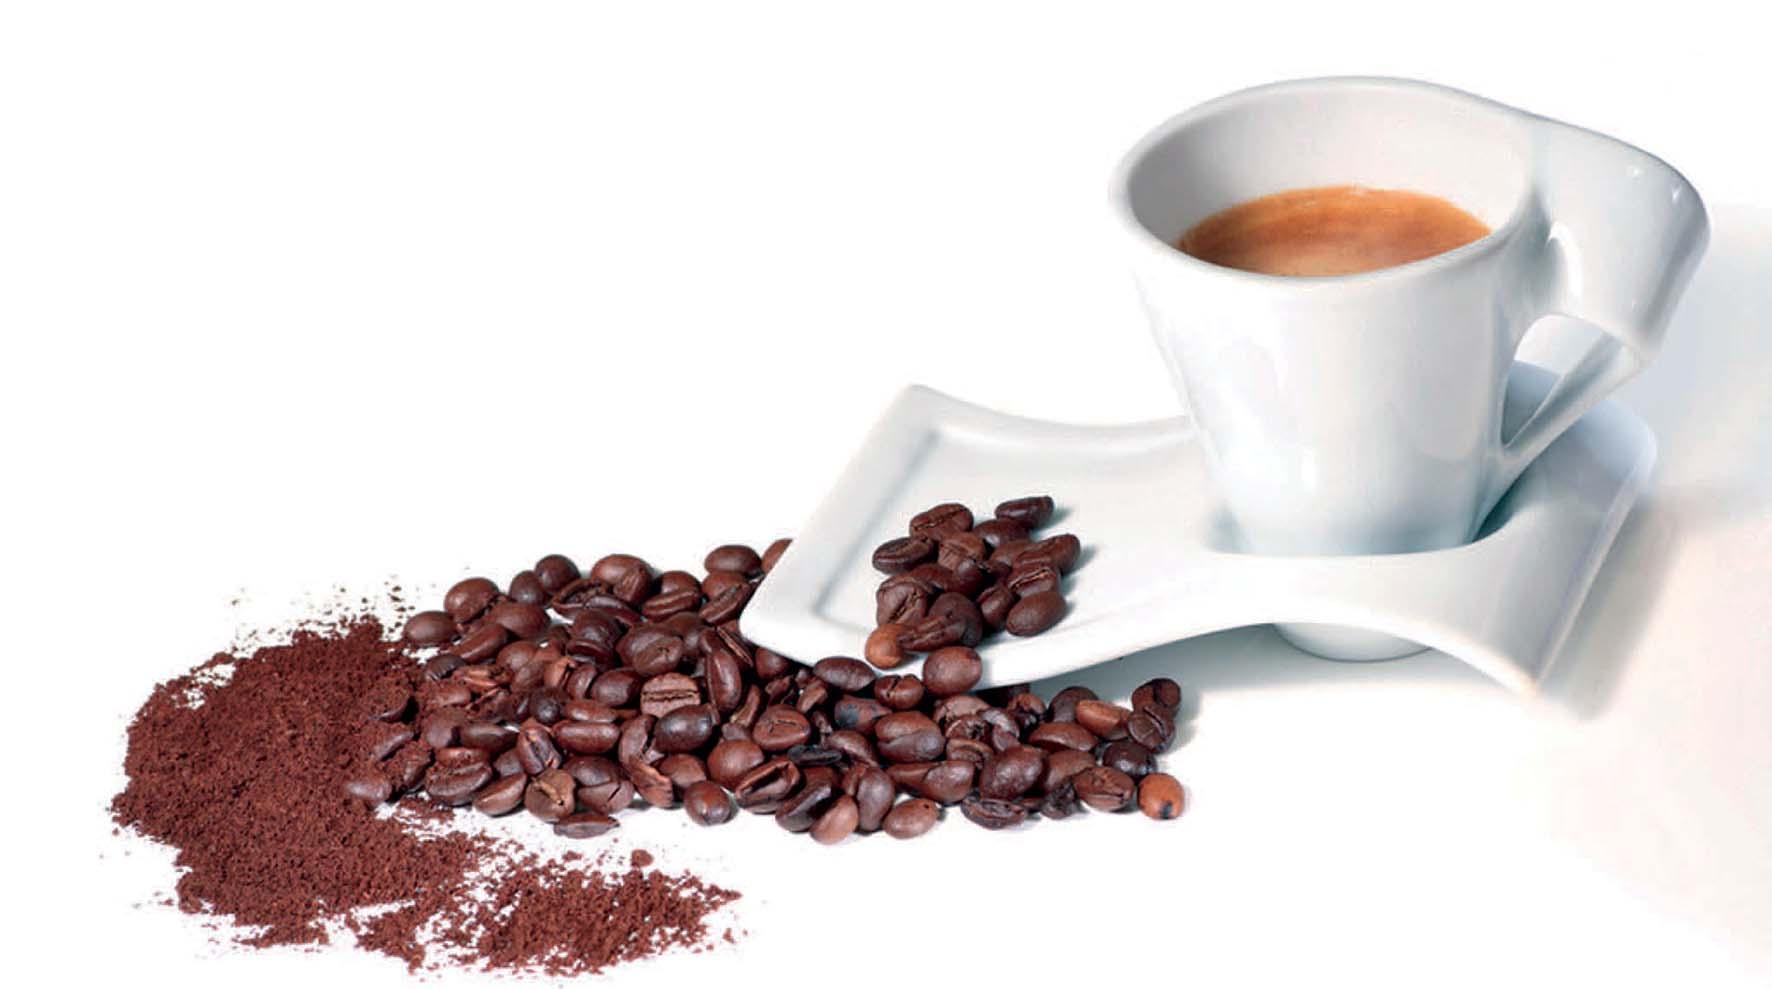 caffe tazzina chicchi